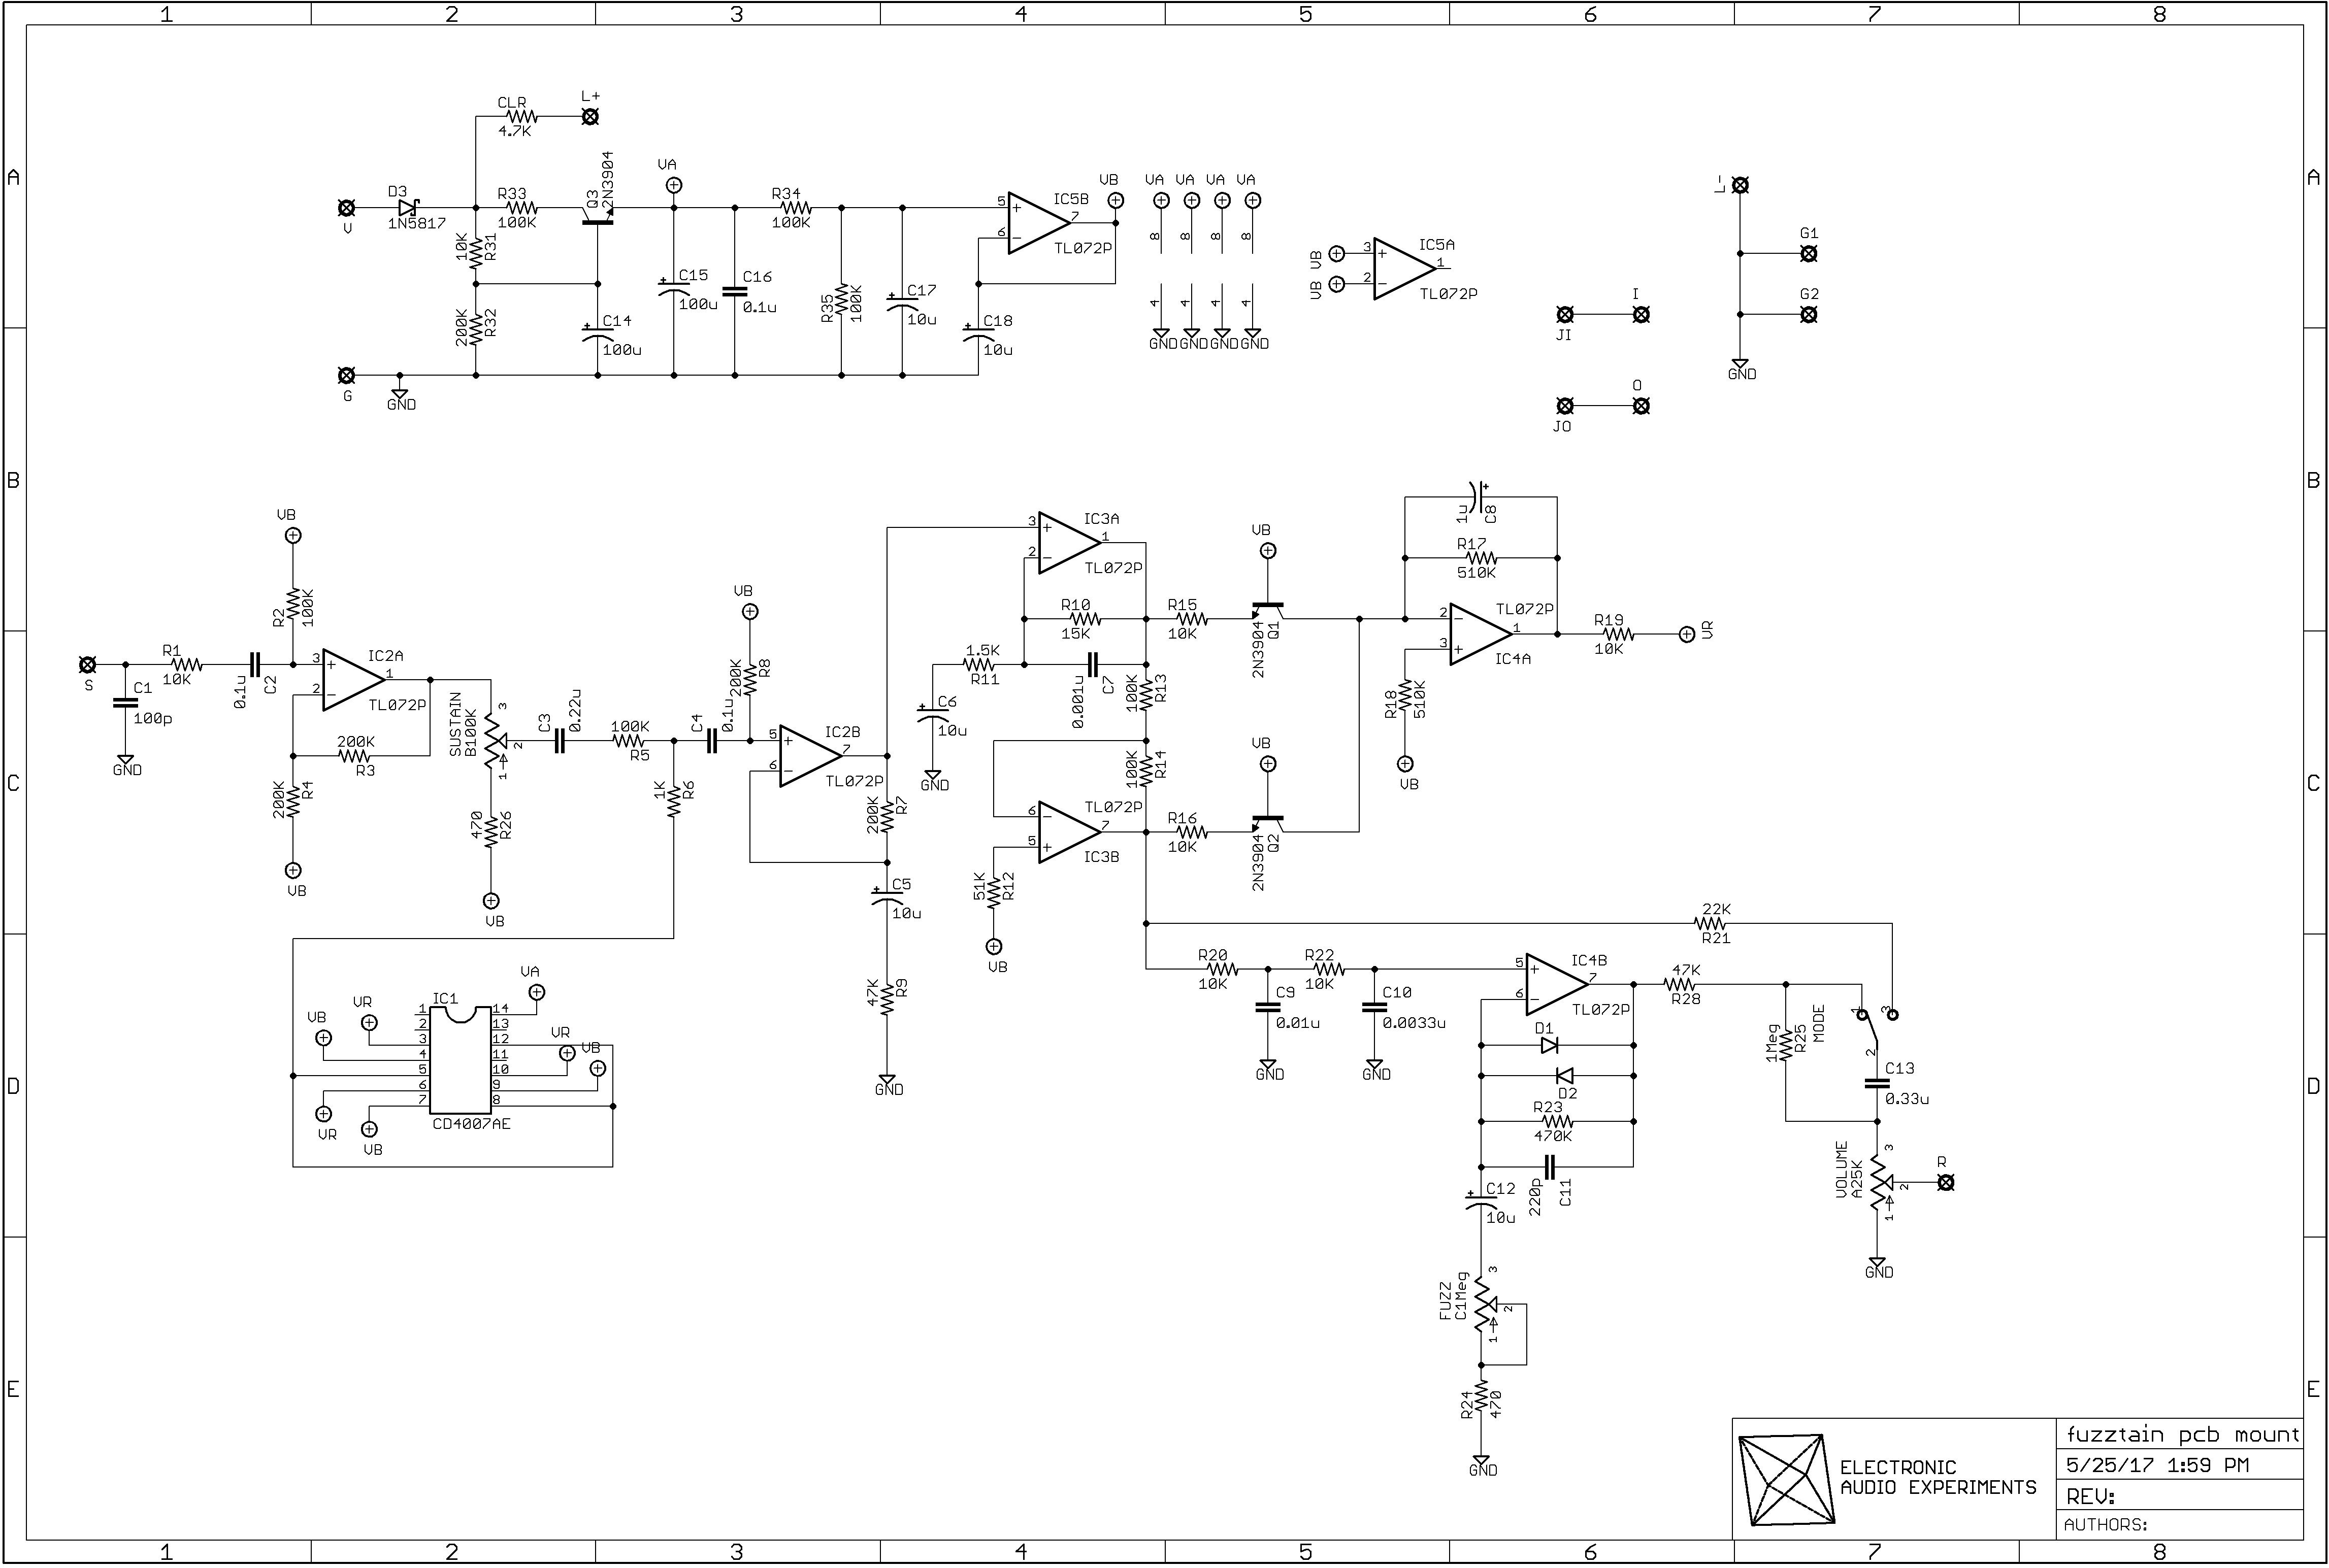 Diy Guitar Compressor Schematic Home Design Audio Electronic Experiments Rh Electronicaudioexperiments Com Wiring Schematics